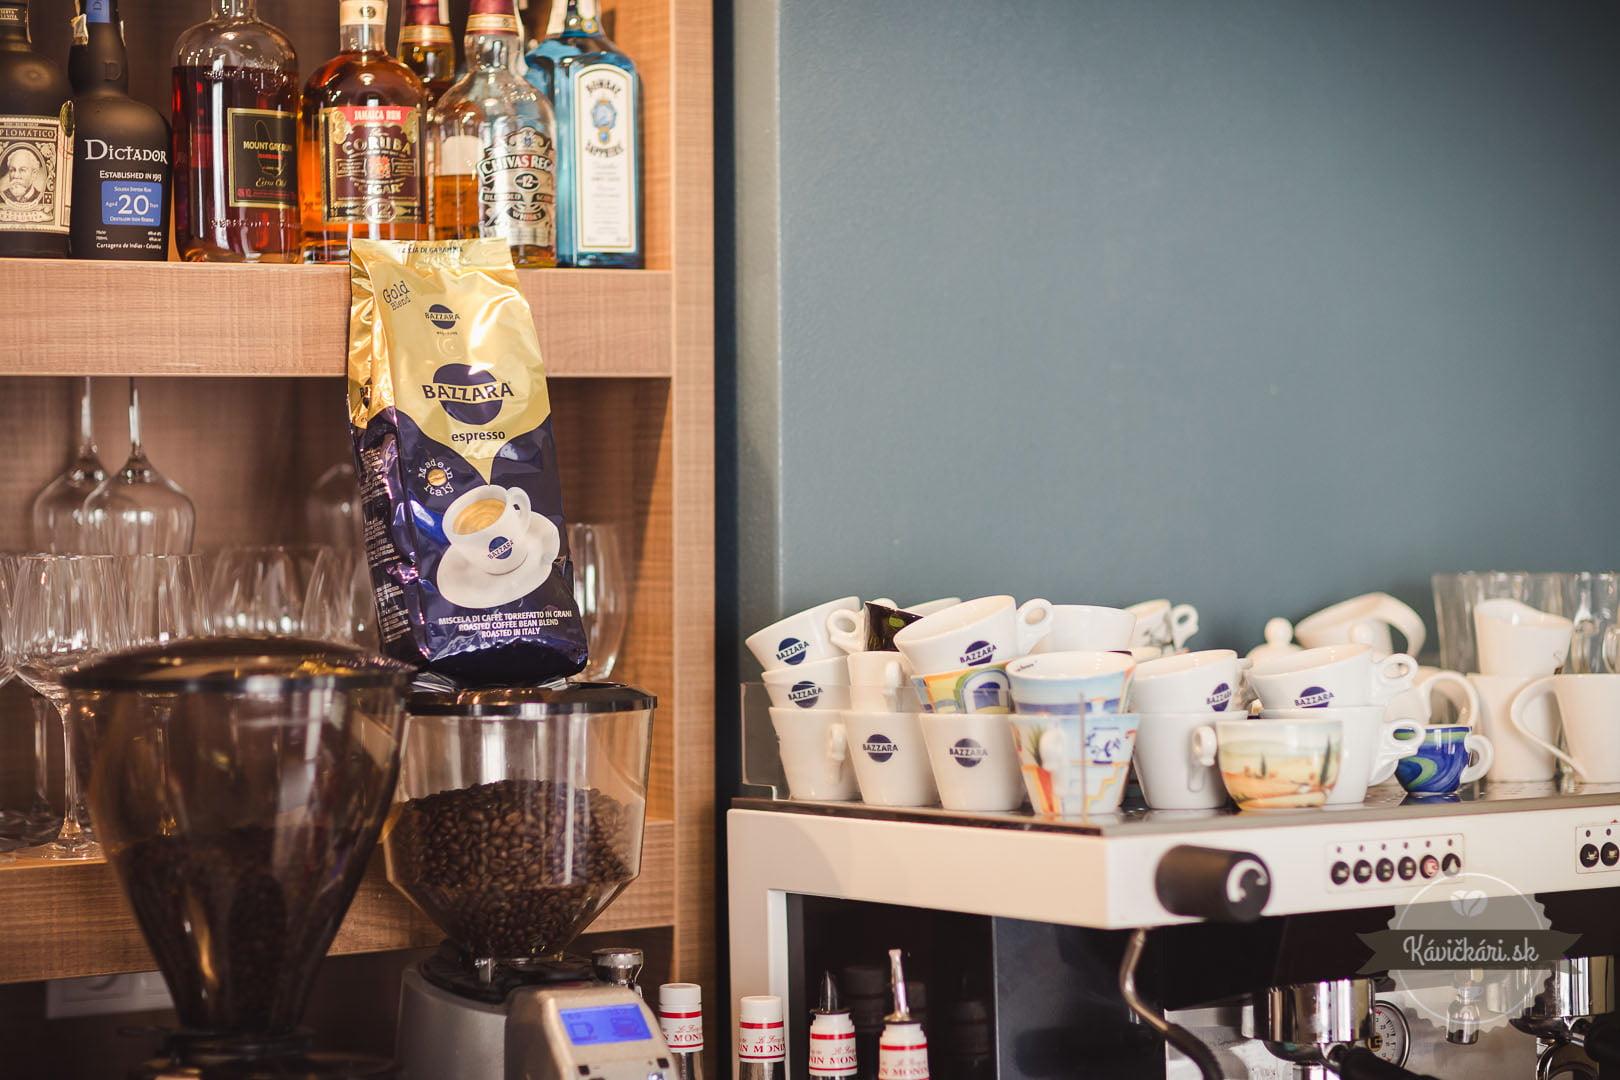 bazzara káva beniczky